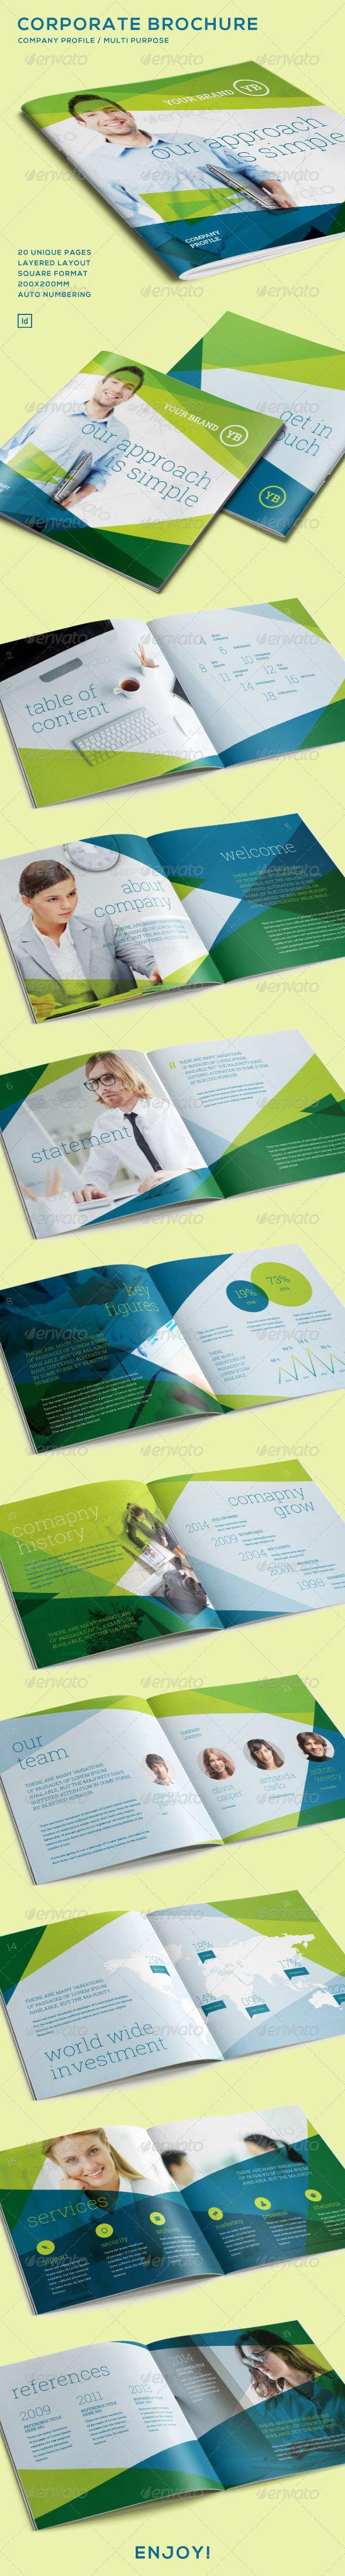 Contoh Refrensi Layout Company Profile